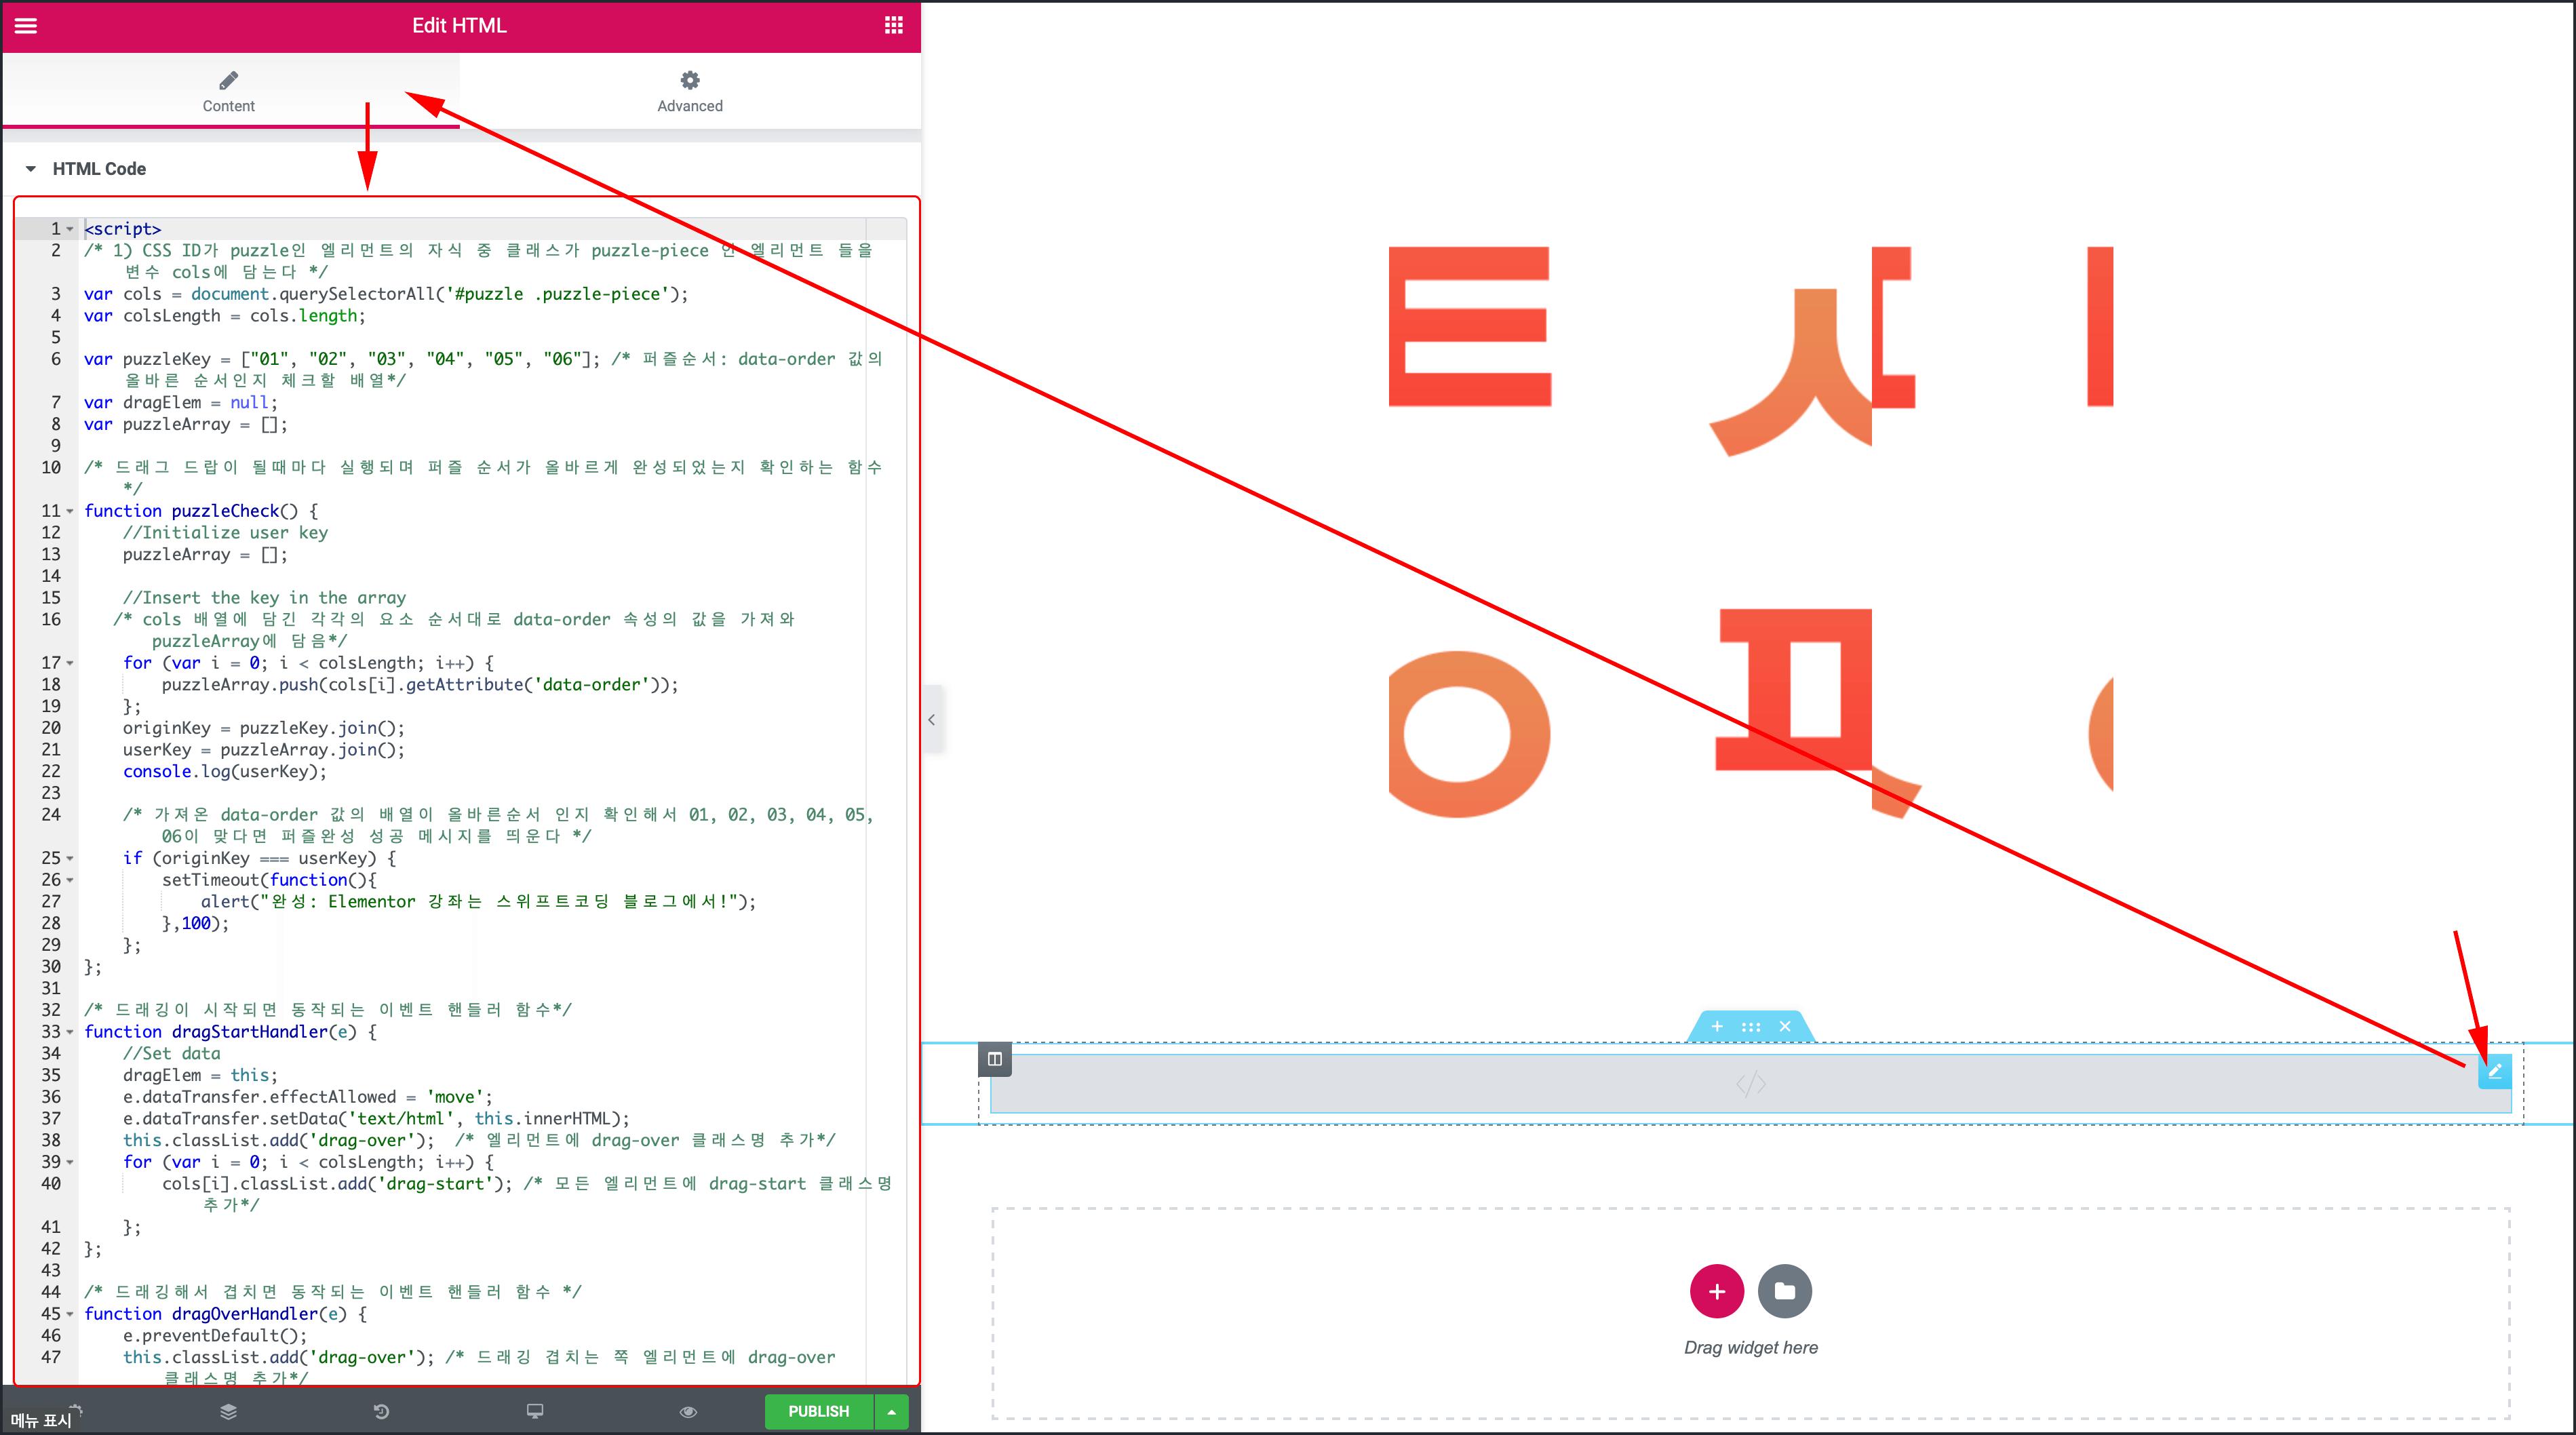 HTML 위젯의 Content , HTML Code 입력란에 script 태그로 시작하는 코드가 작성되었다